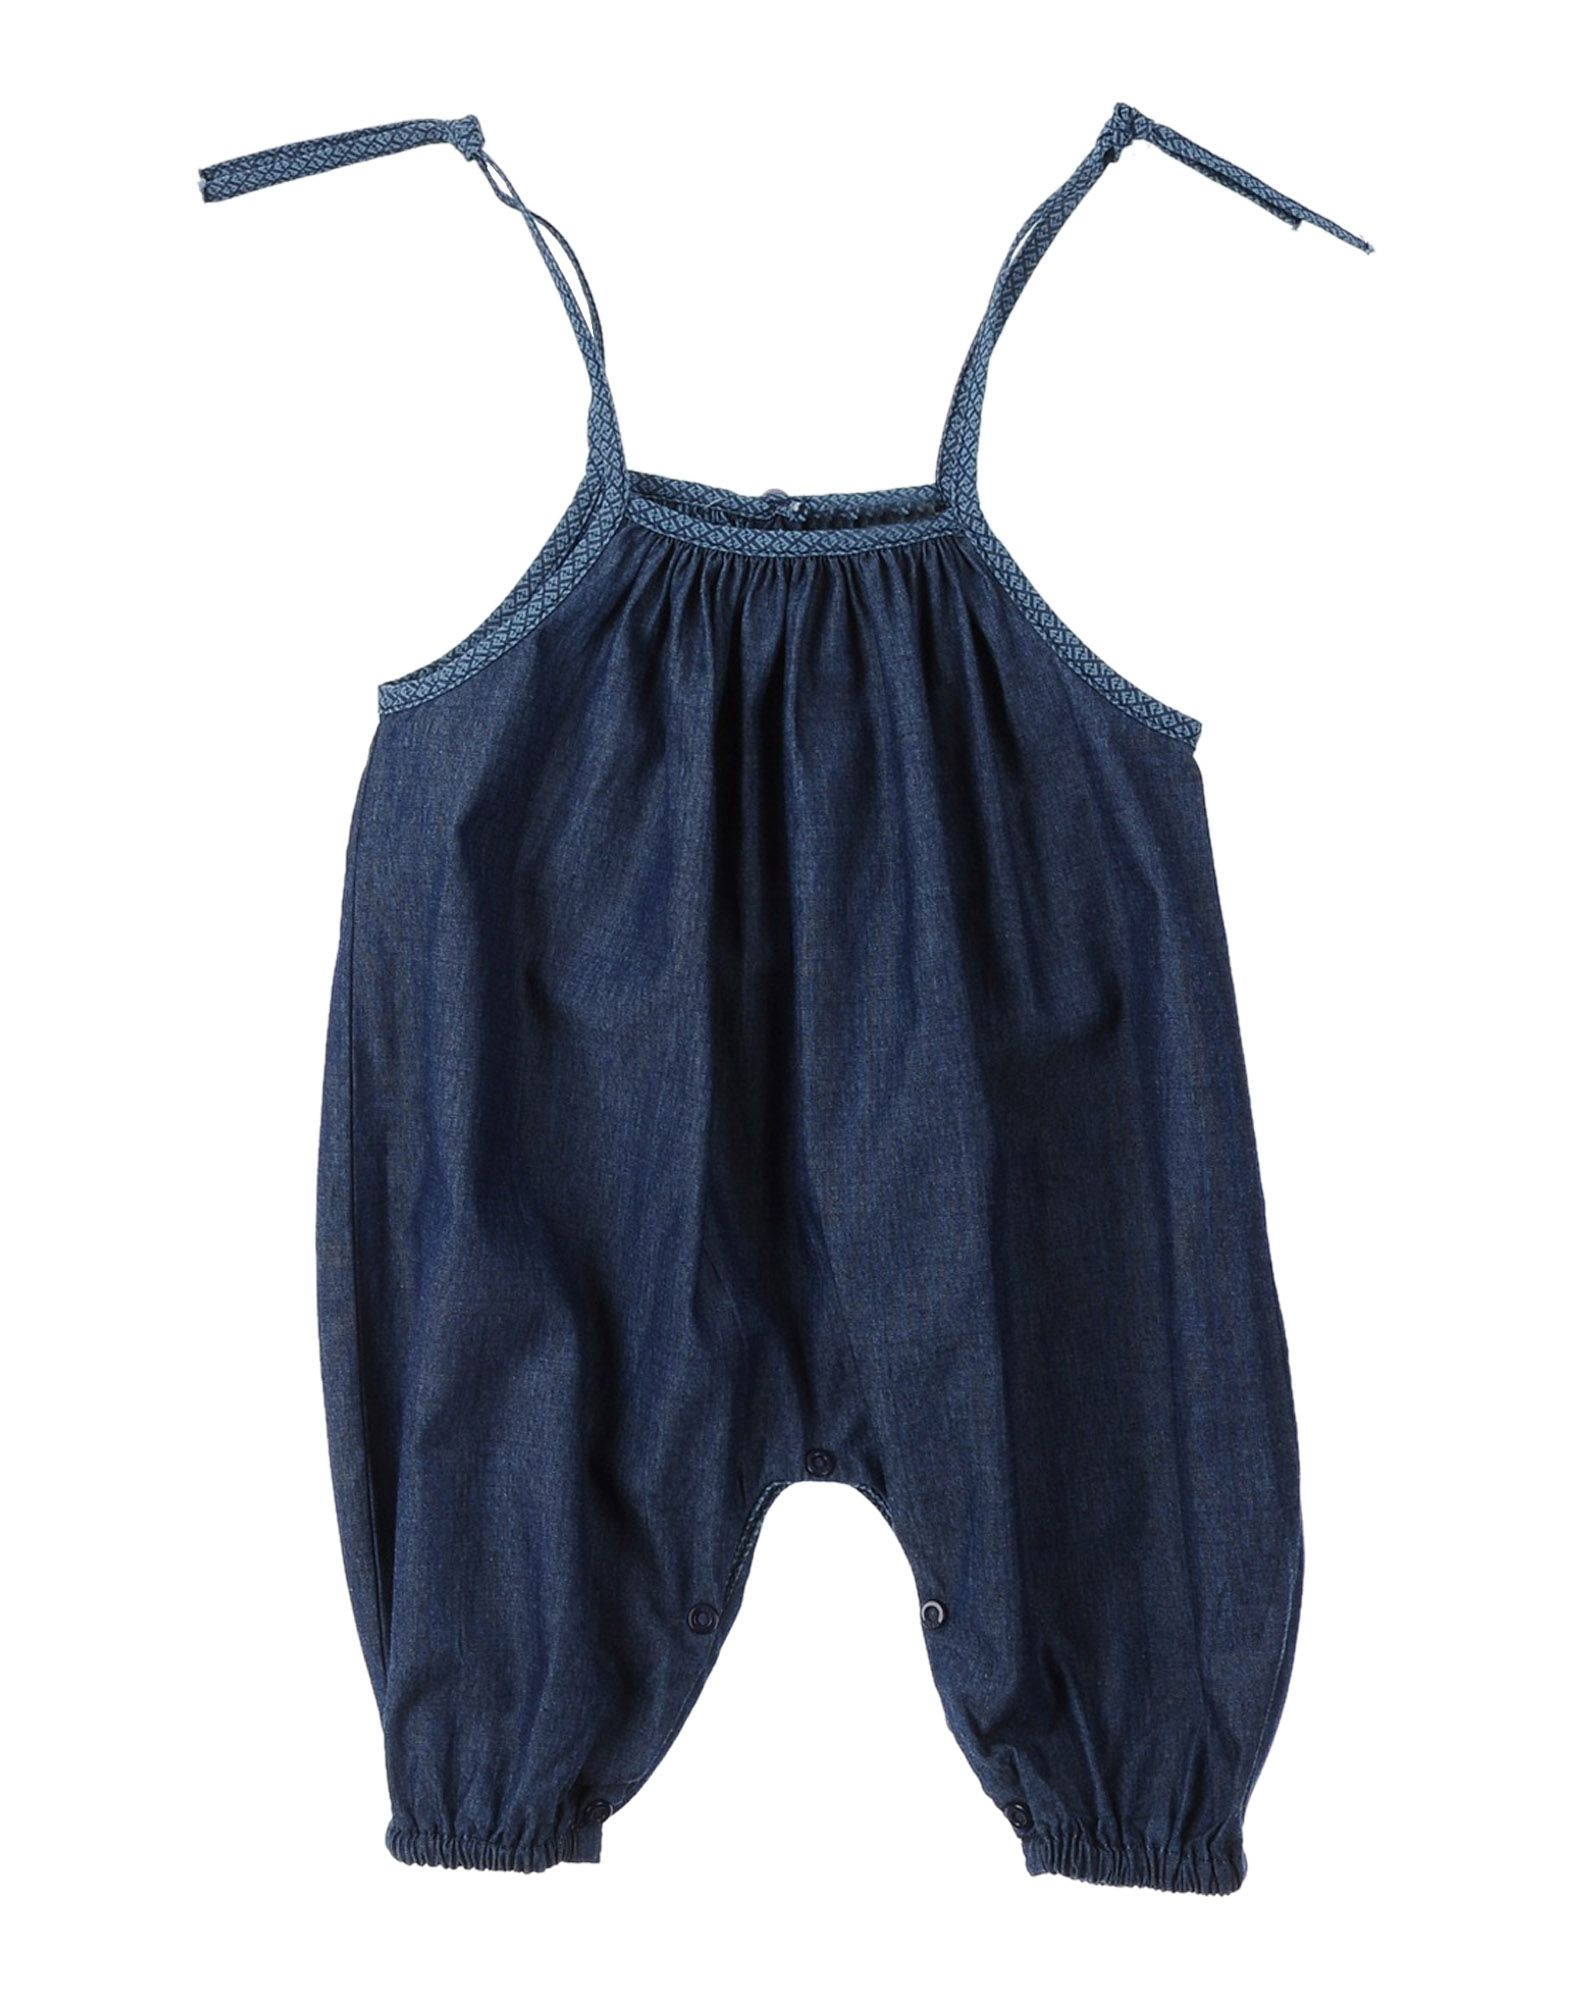 FENDI Baby overalls